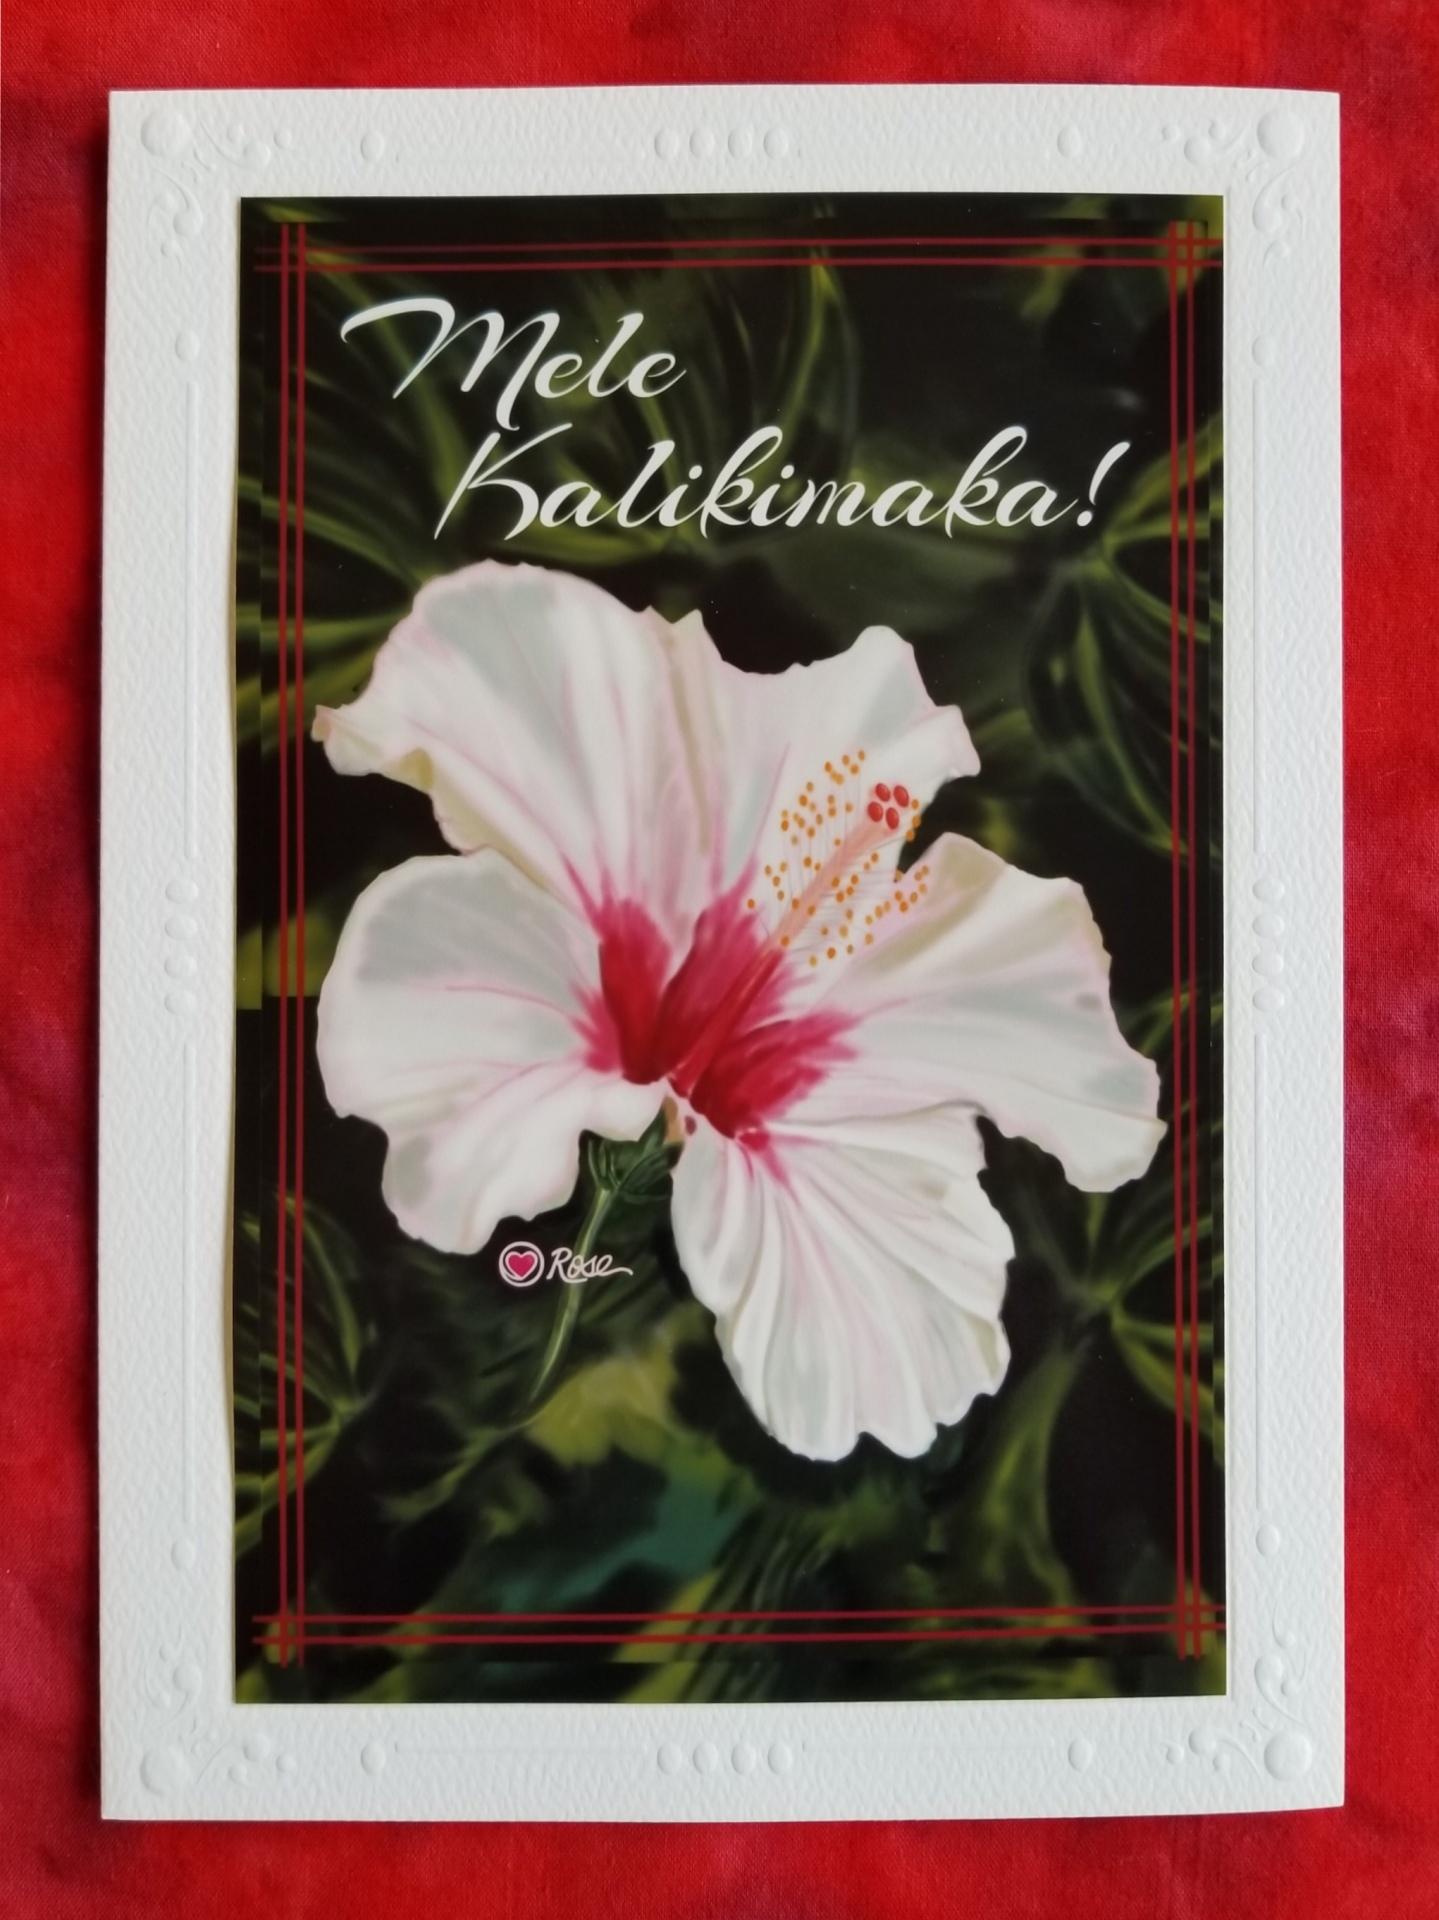 Mele Kalikimaka Hibiscus